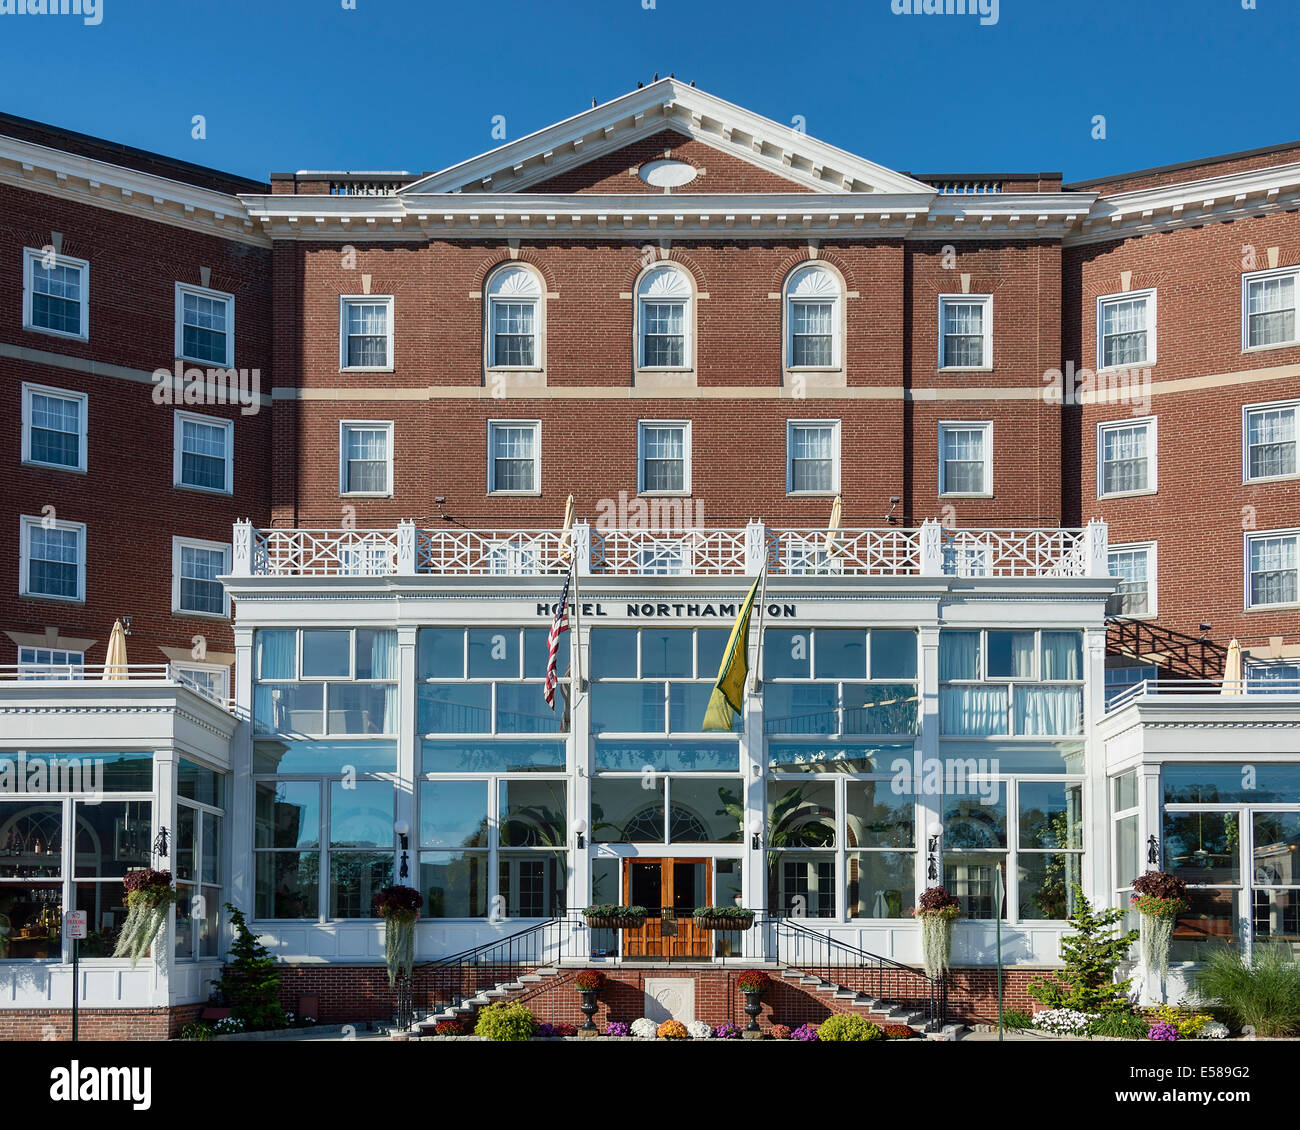 Exterior of the Northhamiton Hotel, Northampton, Massachusetts, USA - Stock Image